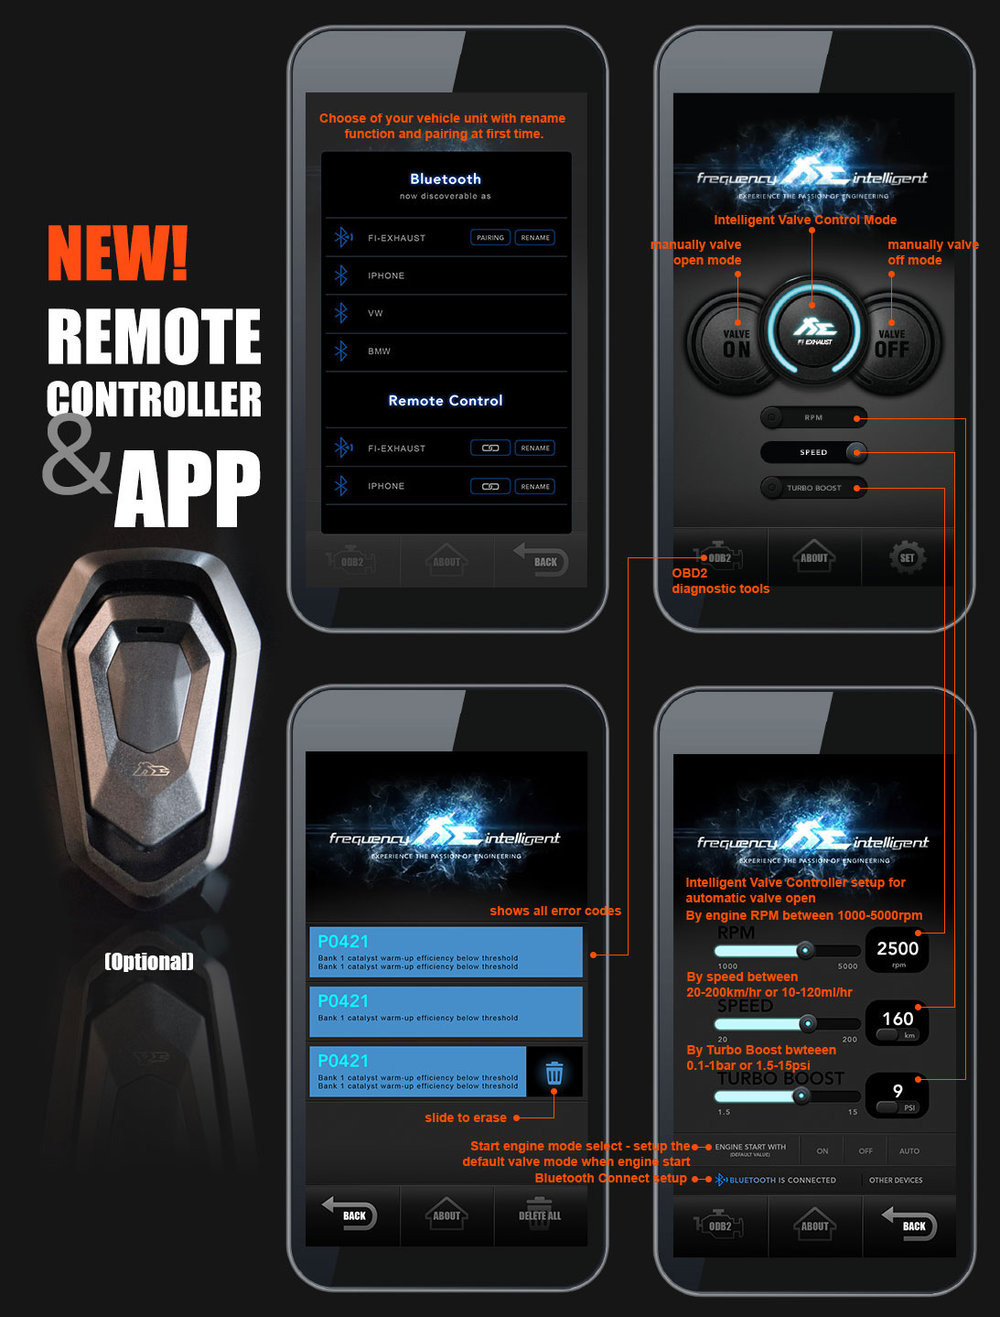 EemoteControllerAndApp-1.jpg